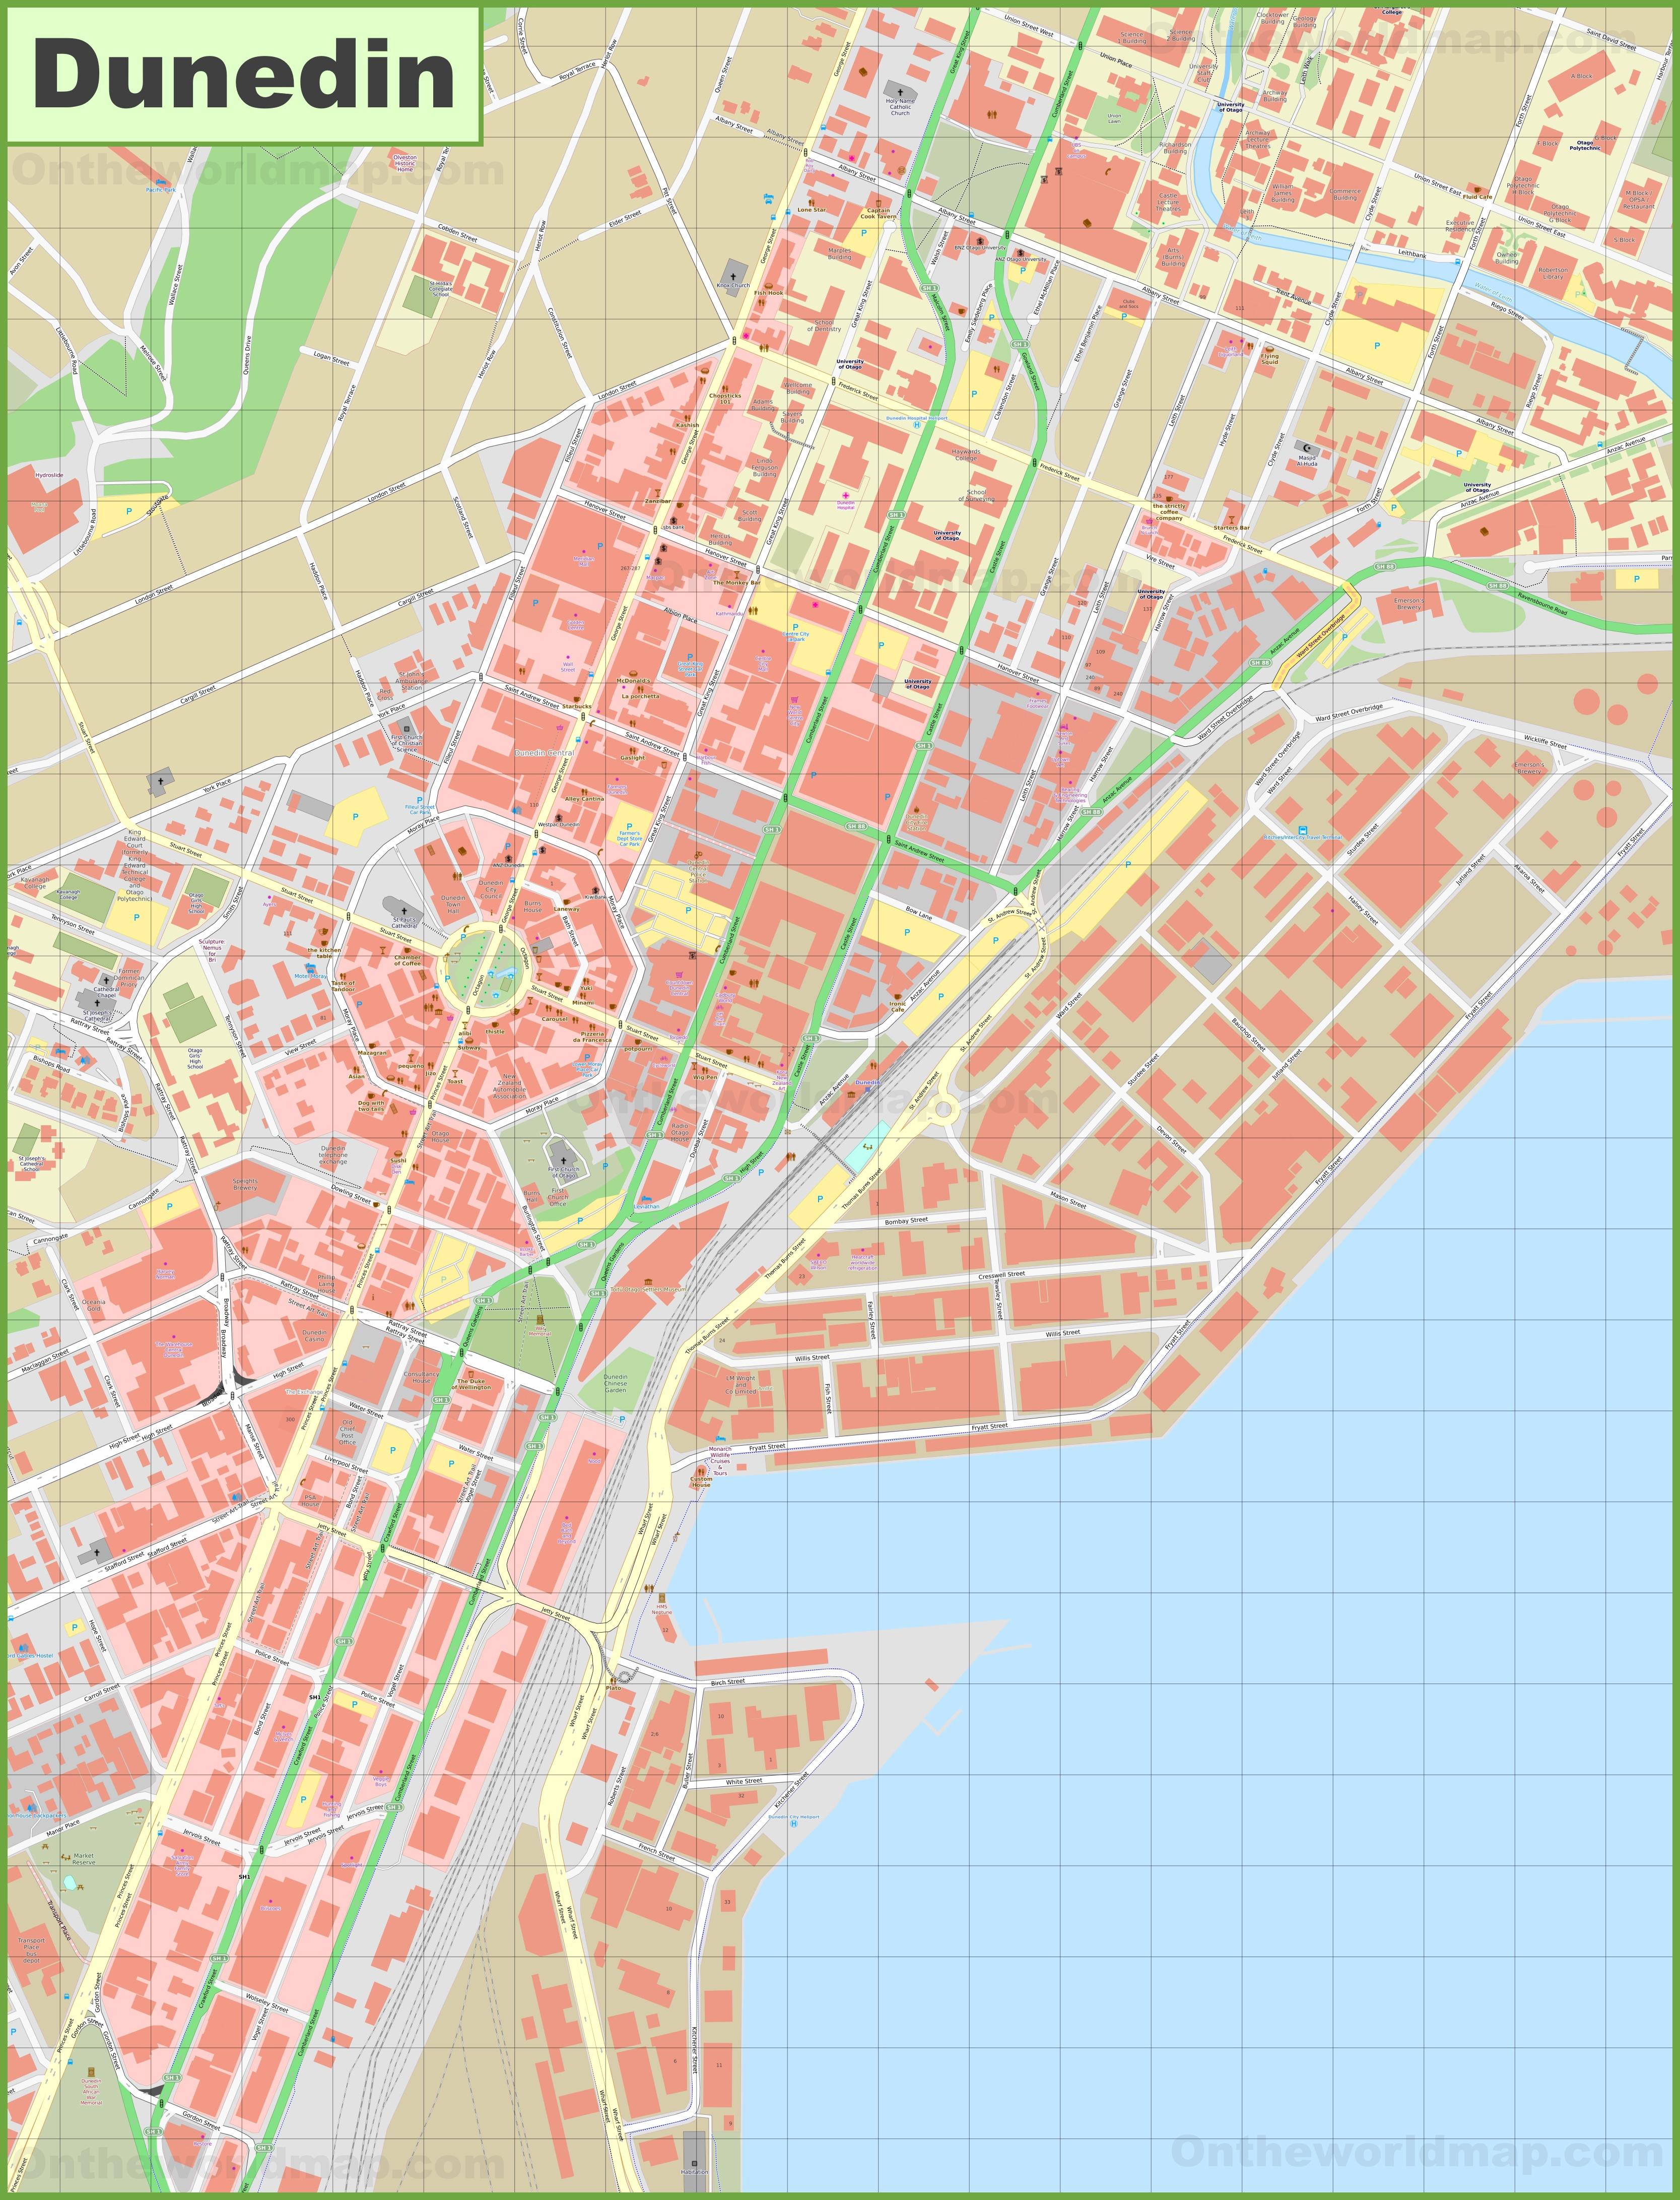 Map Of Dunedin New Zealand.Dunedin Cbd Map